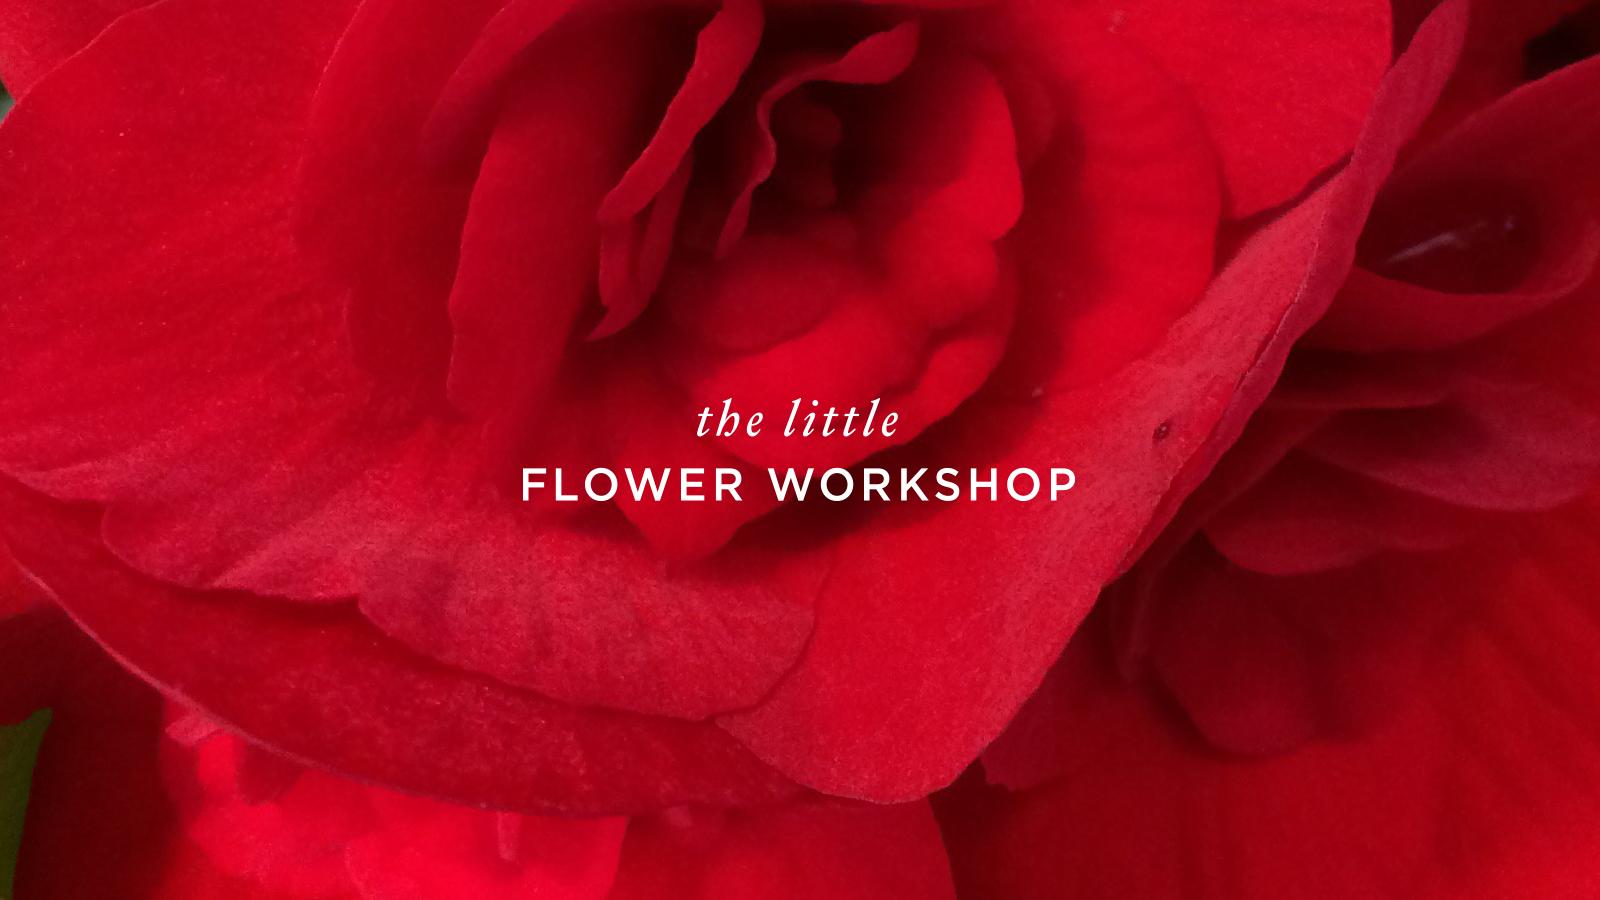 The-Little-Flower-Workshop-Logo-Designed-By-ALSO-Agency